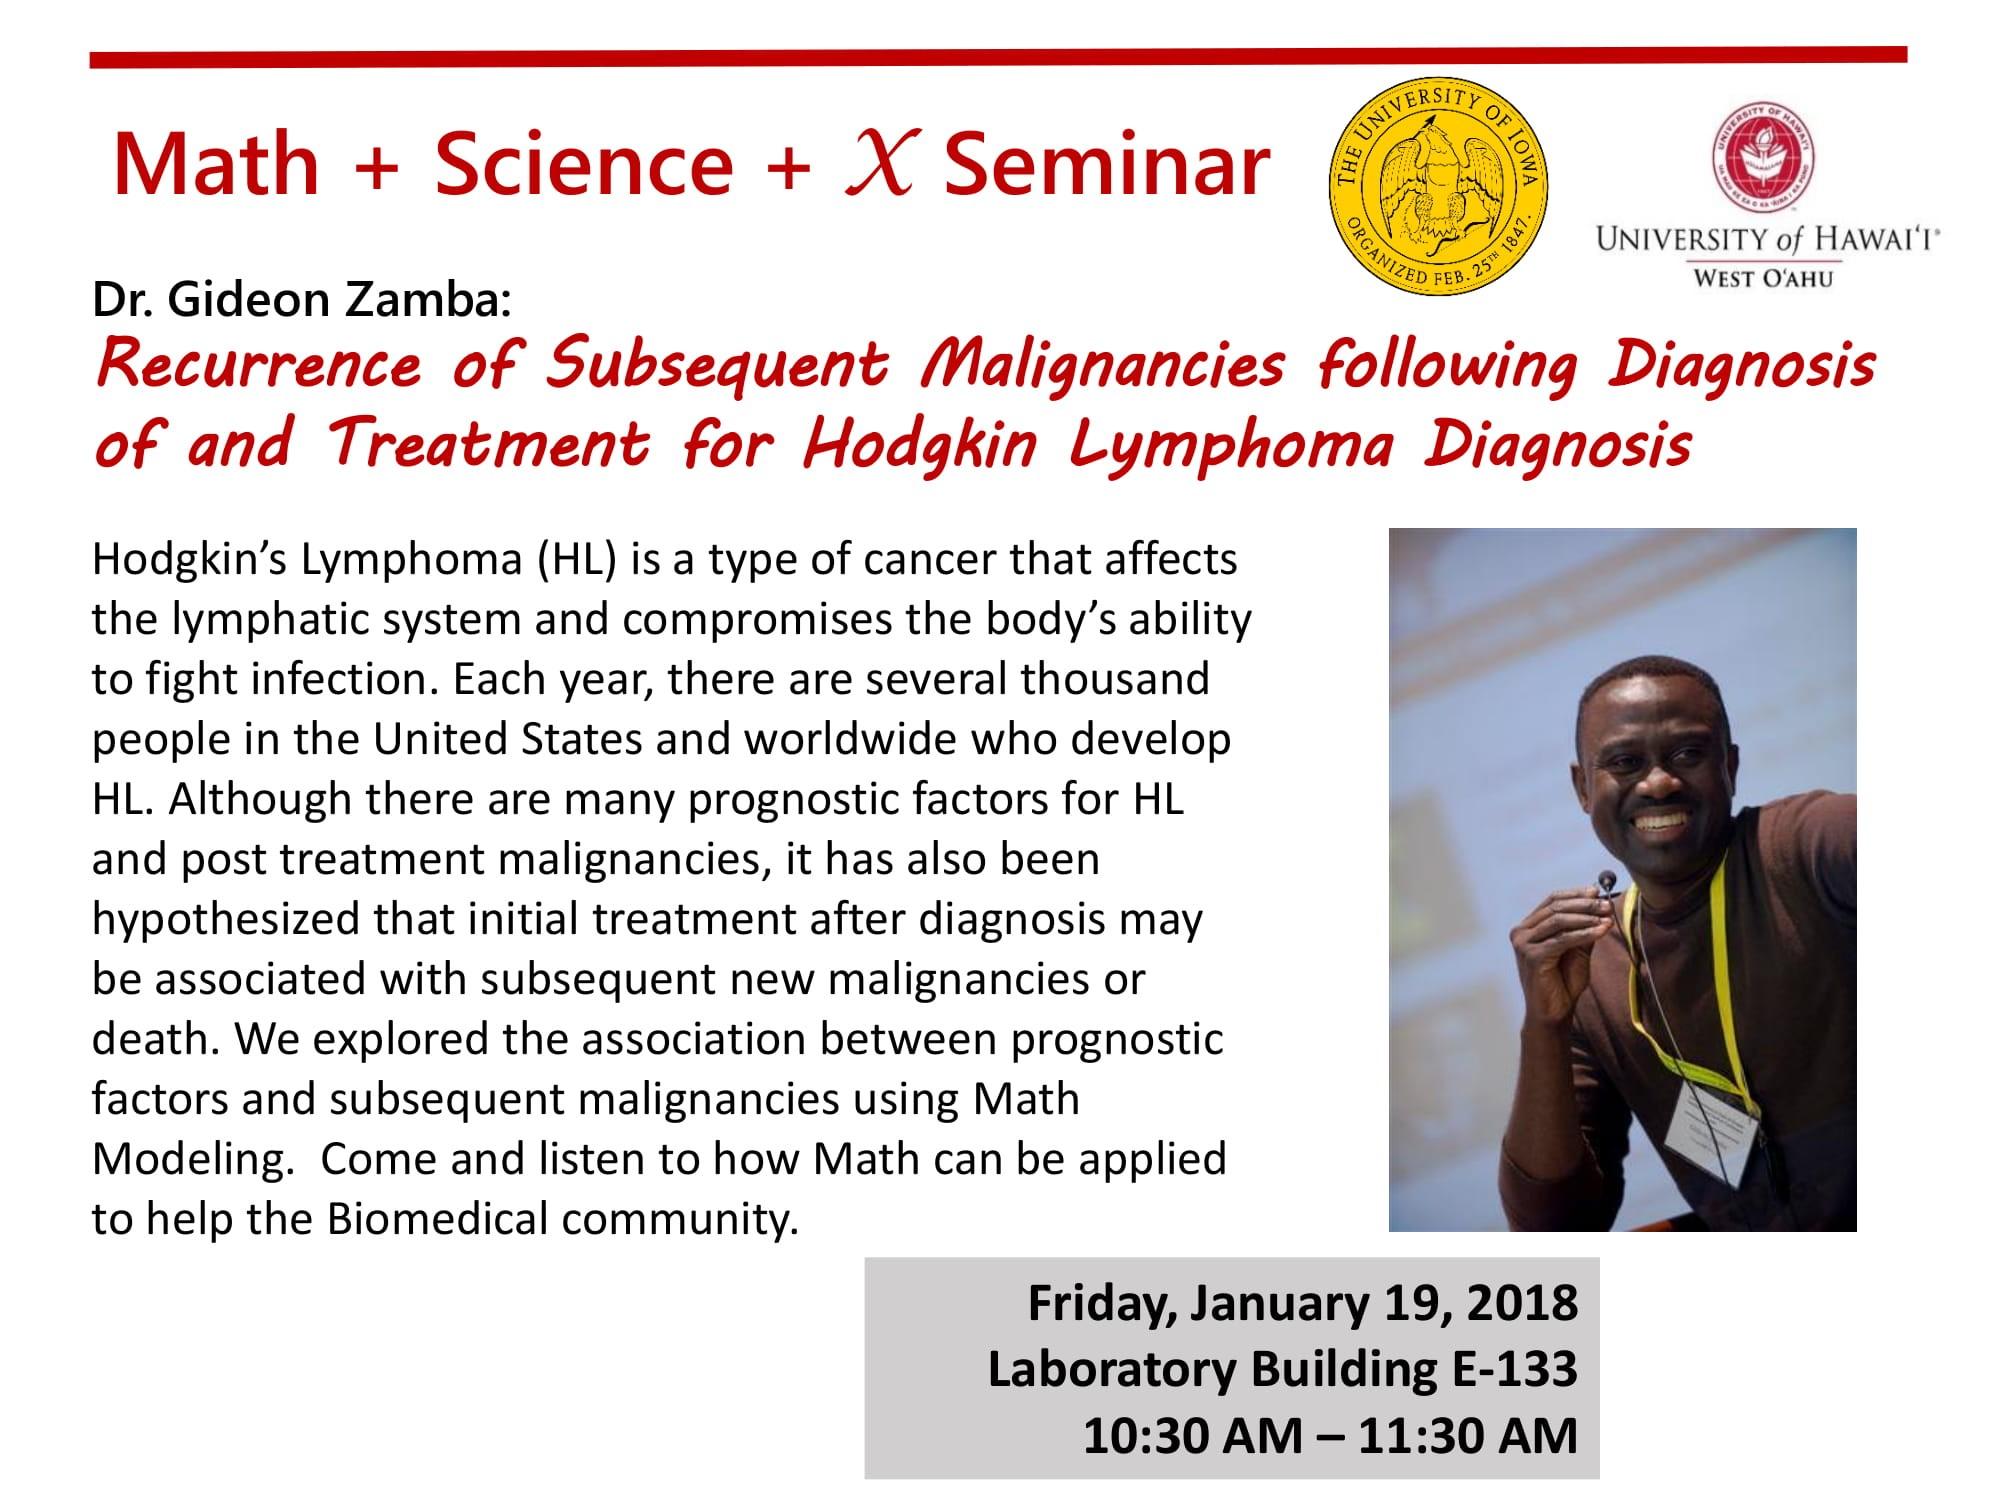 Flyer for Math + Science talk Jan. 19, 2018